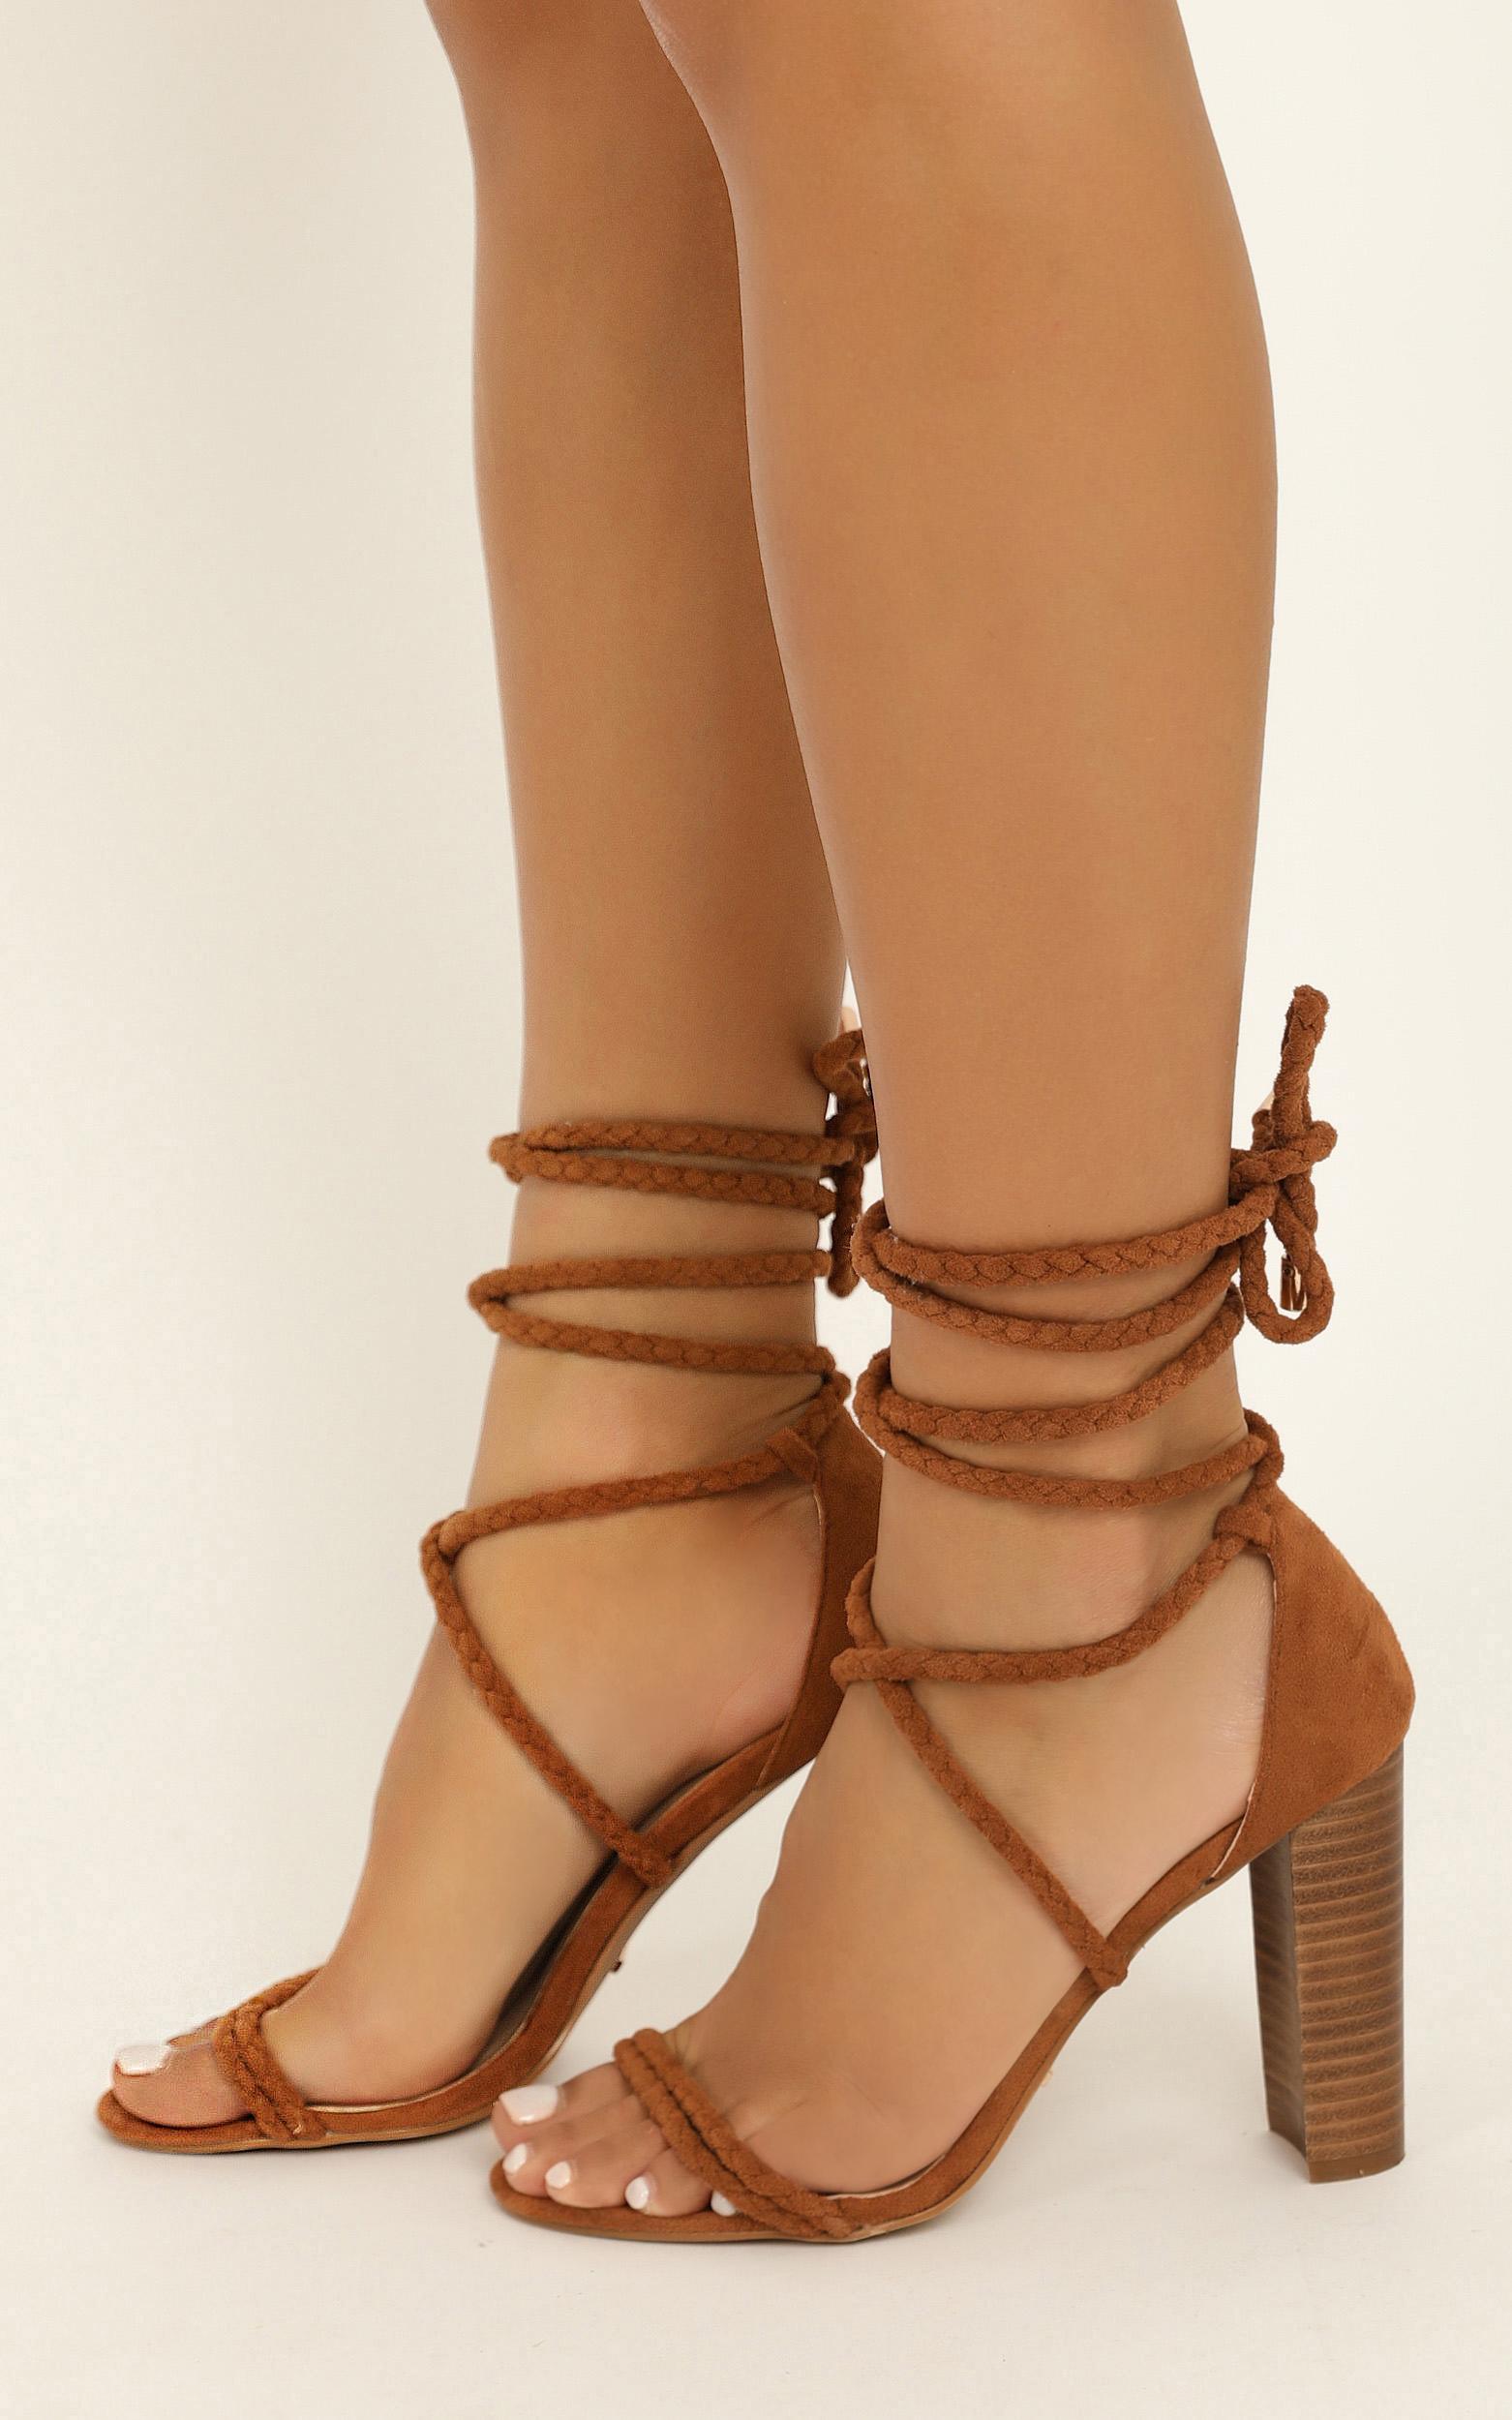 Showpo X Billini - Burano heels in chestnut micro - 10, Tan, hi-res image number null